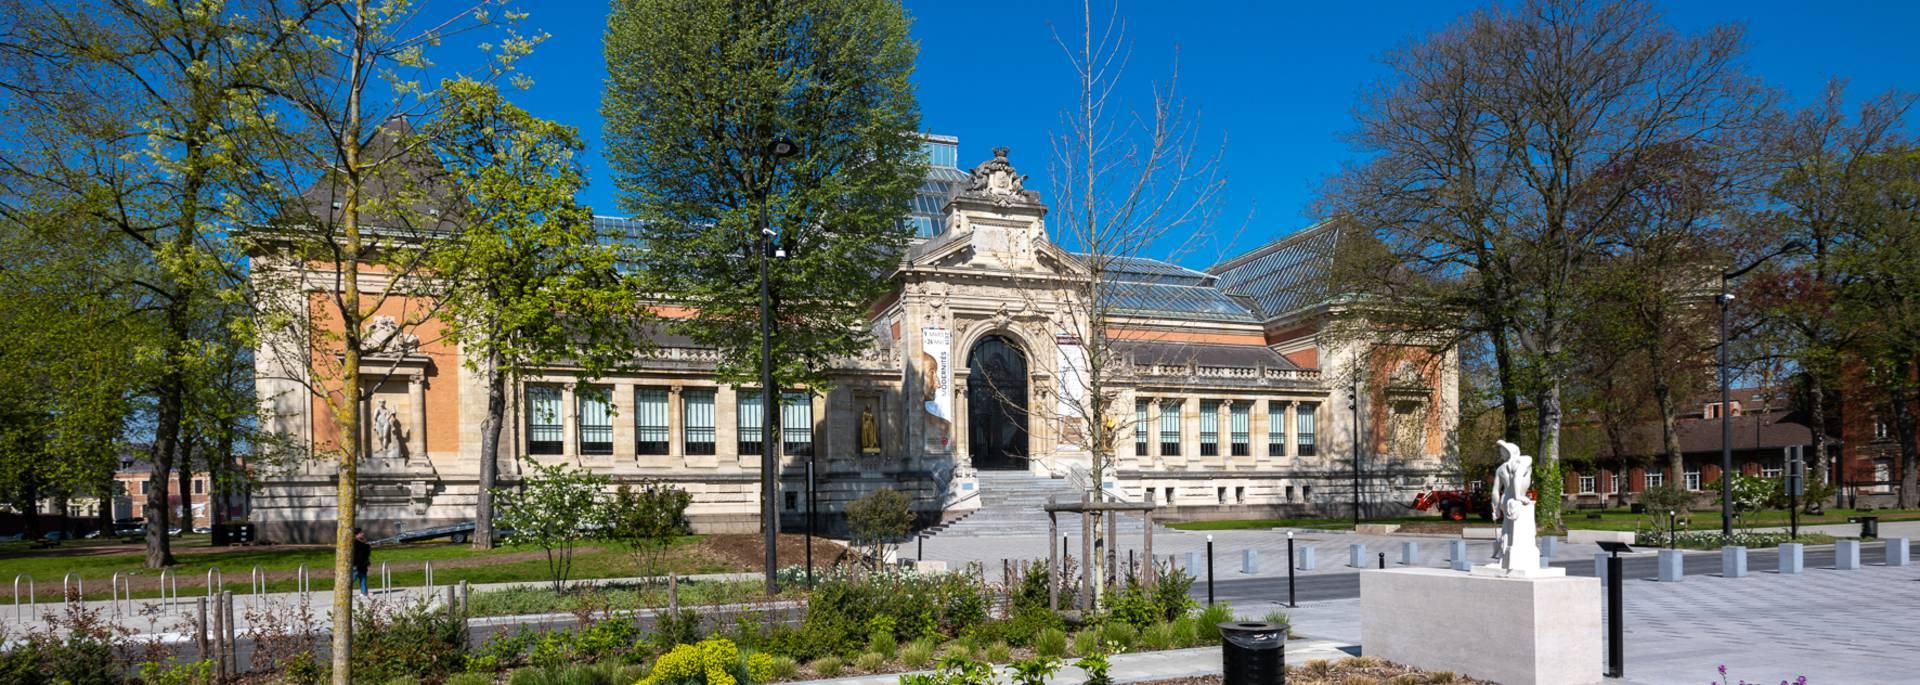 valenciennes-musee-des-beaux-arts-otcvmcclaude.waeghemacker-hd-2.jpg